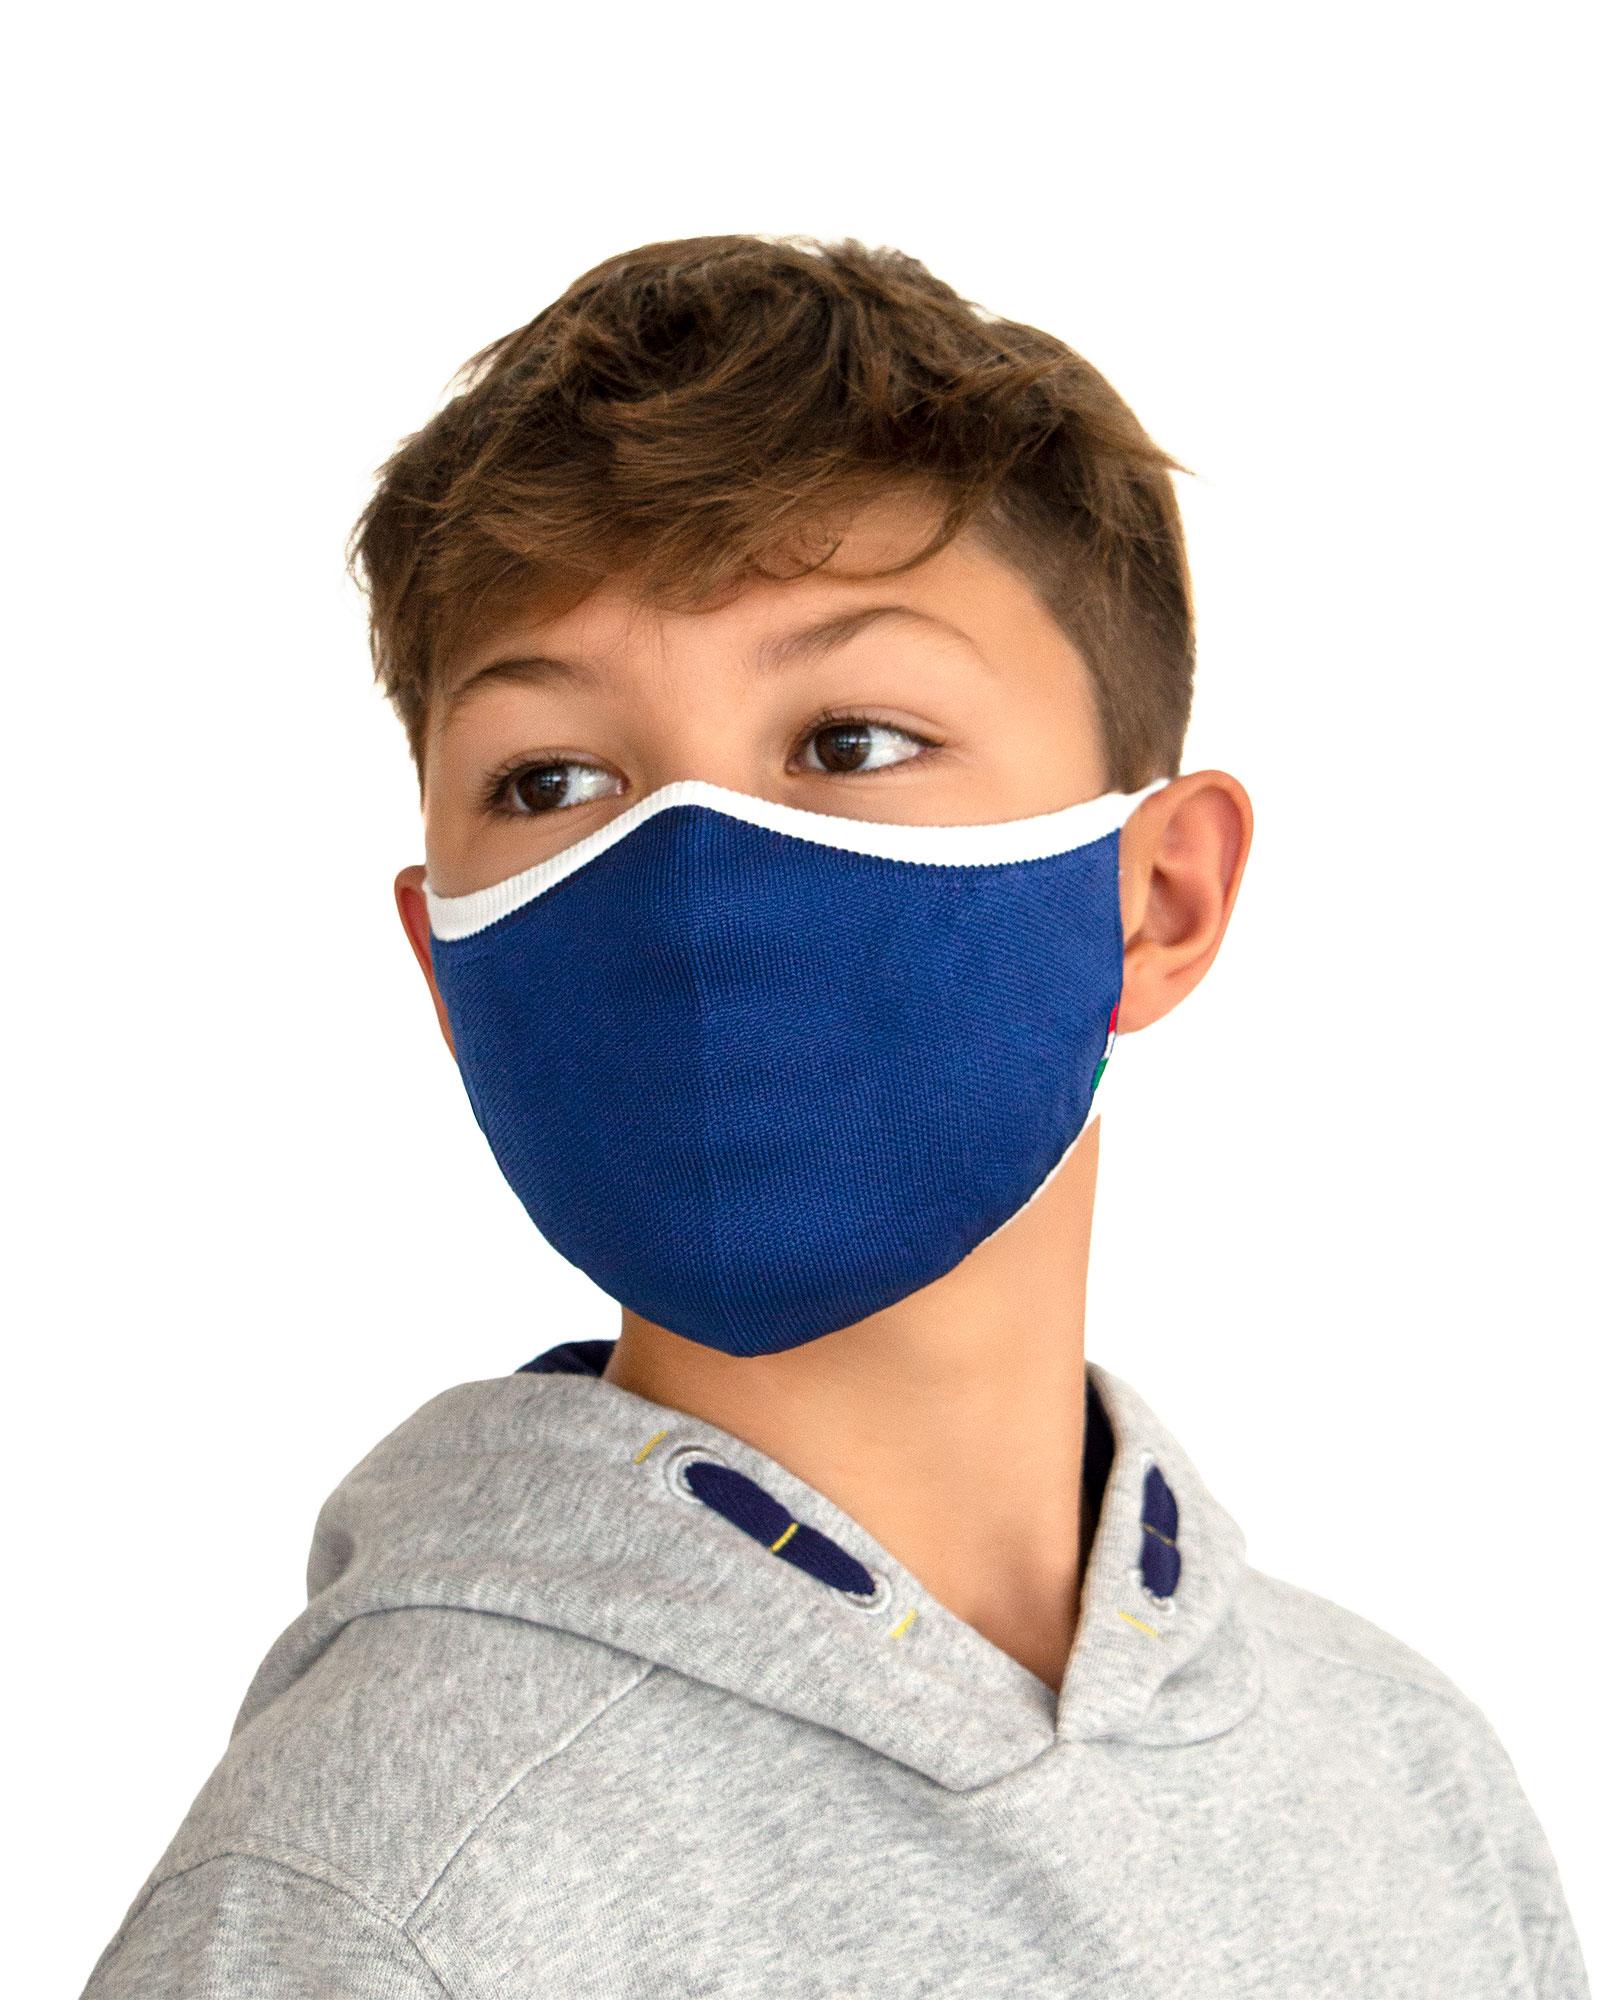 KIDS-MASK-01S-relaxsan-unima-kids-mask_371-BLUE-ROYAL_boy